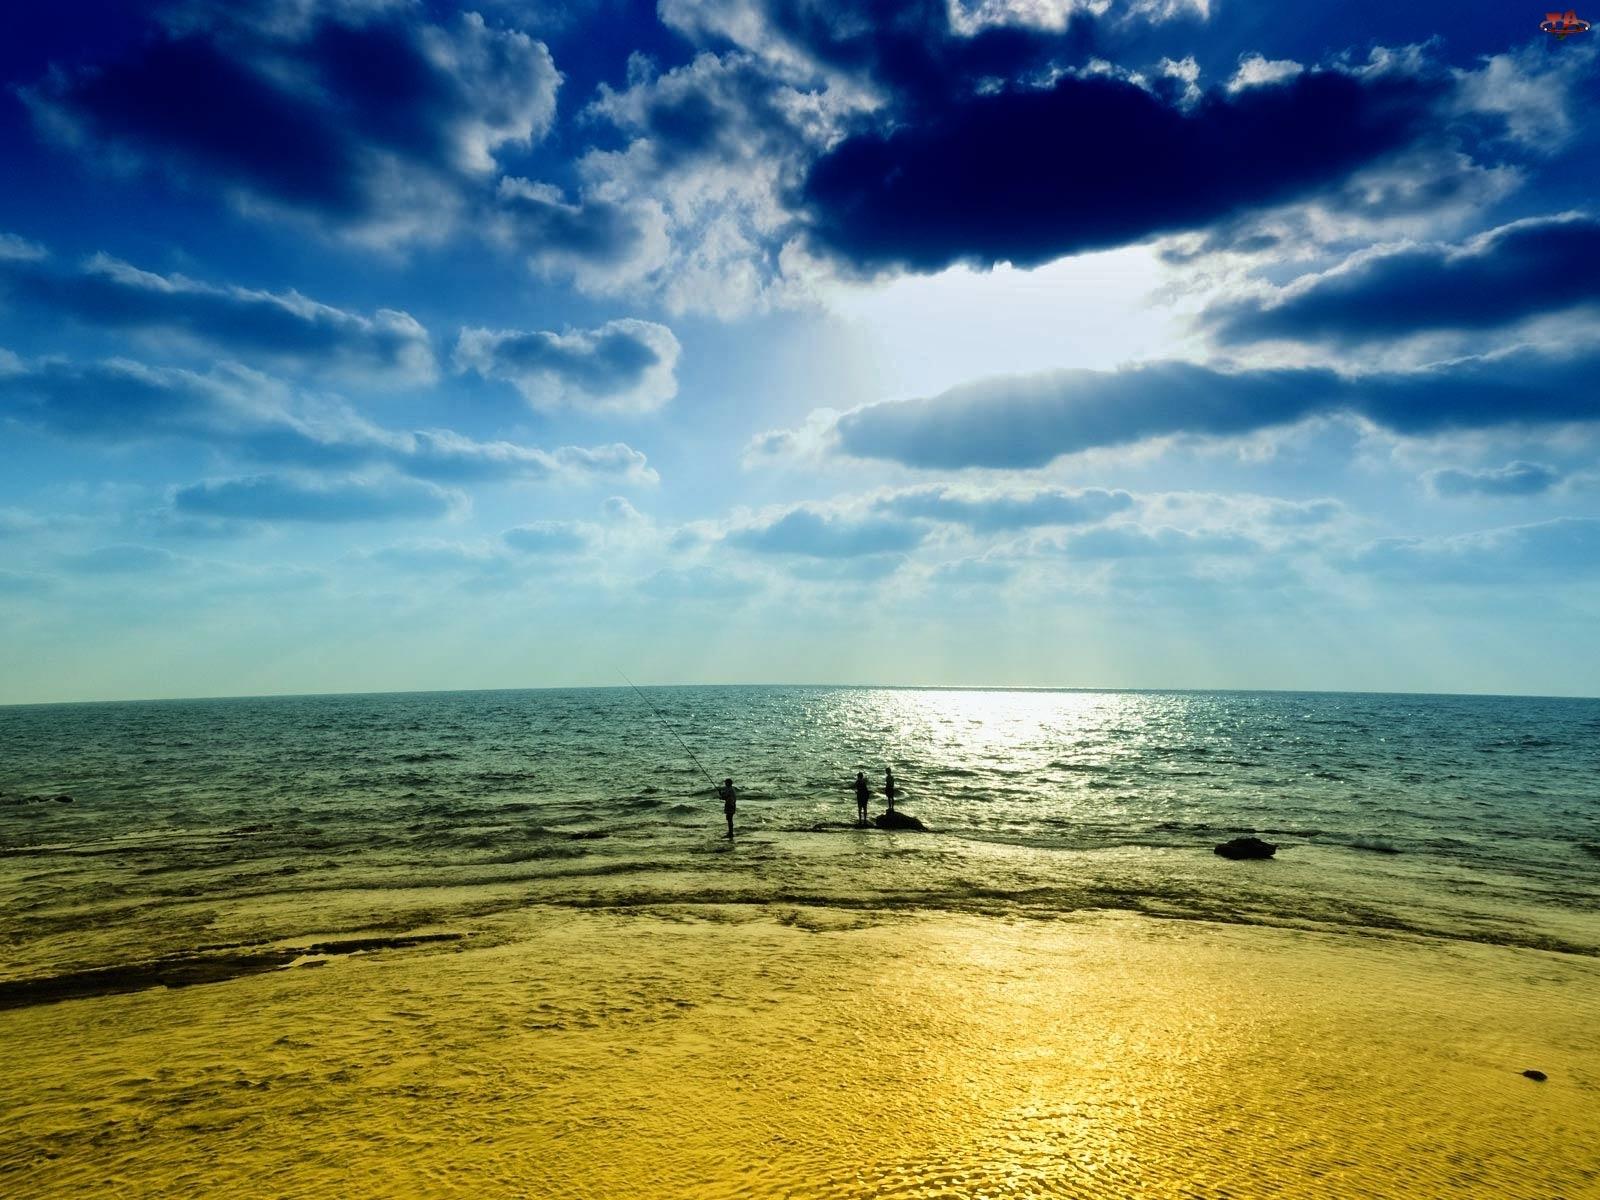 Chmury, Morze, Wędkarze